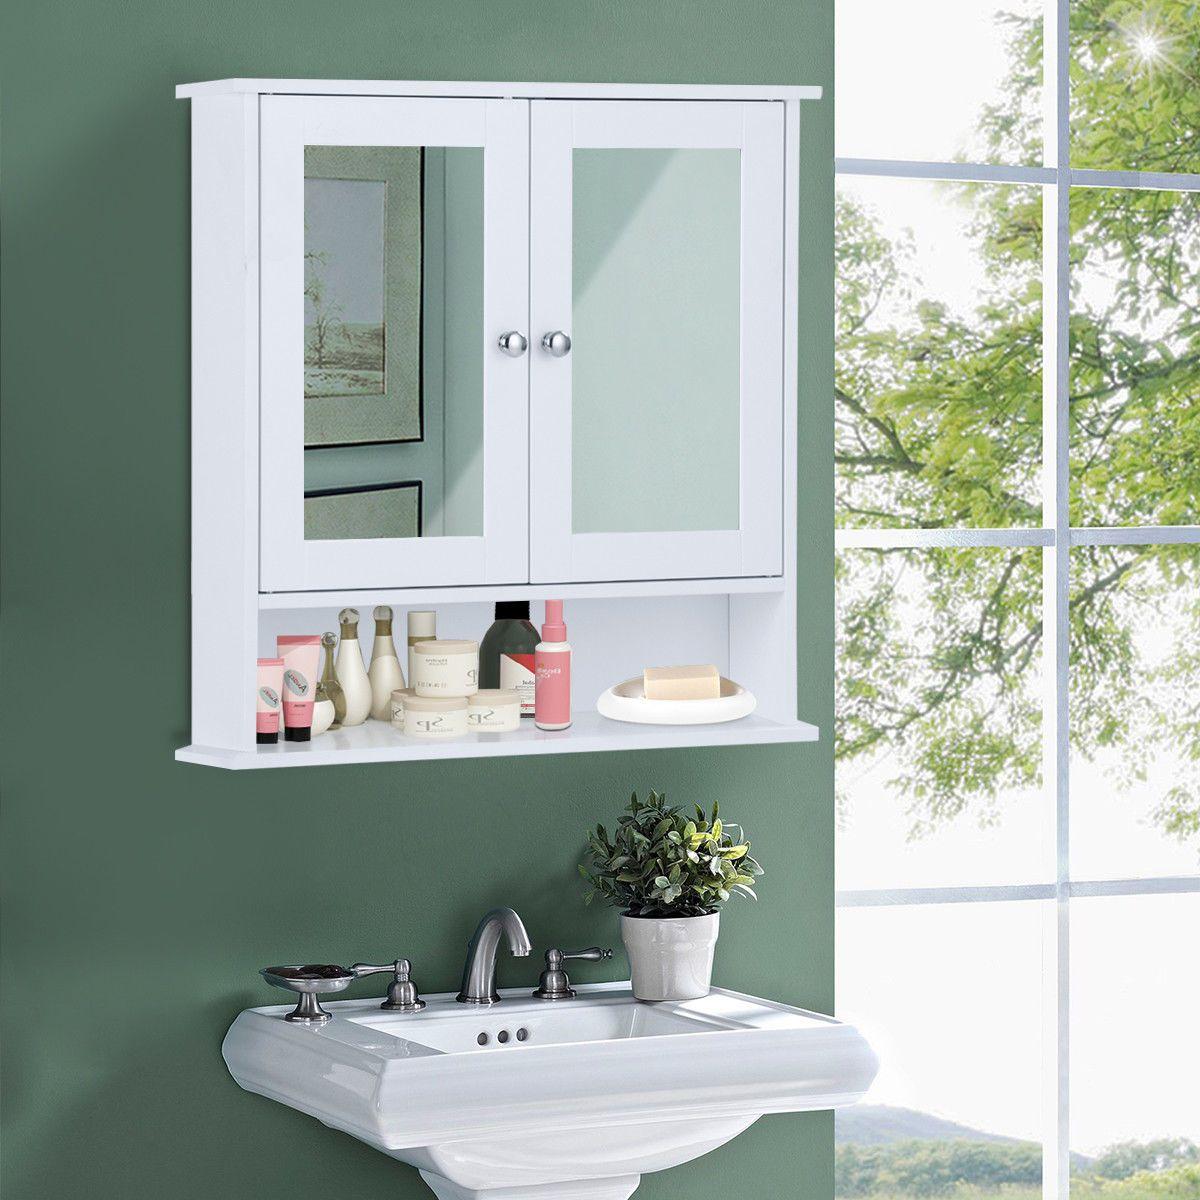 New Bathroom Wall Cabinet Double Mirror Door Cupboard Storage Wood Shelf White 43 99 End Da In 2020 Rustic Bathroom Wall Decor Bathroom Wall Cabinets Cabinet Cupboard